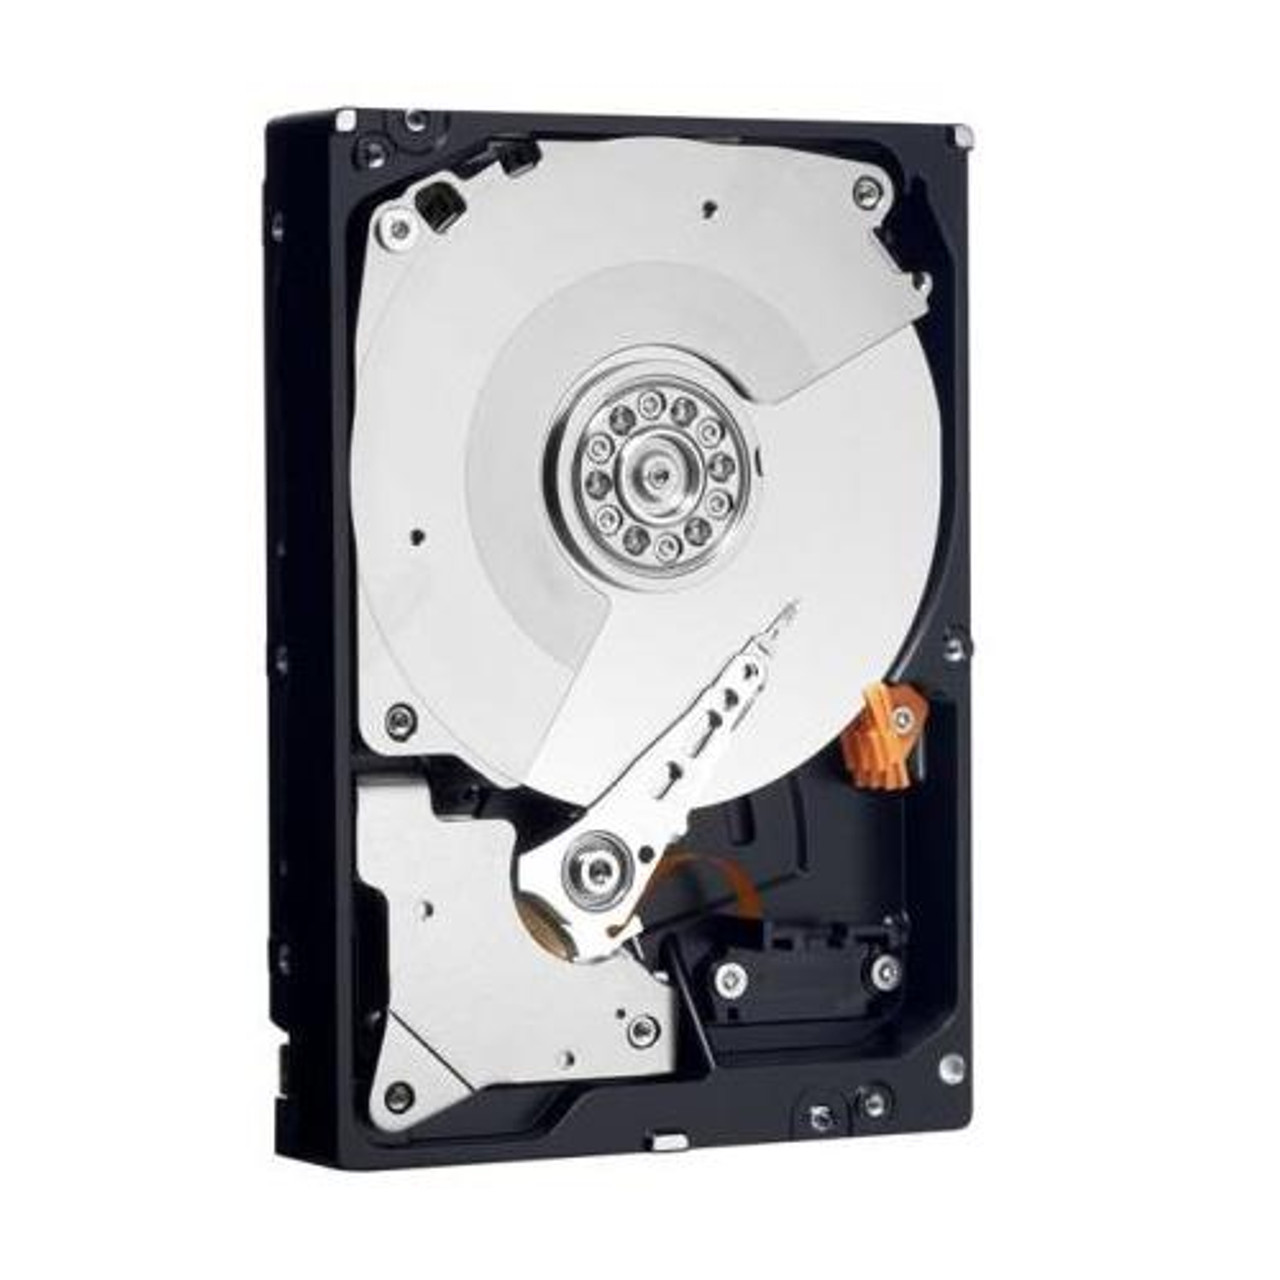 Adamanta 16GB 2x8GB Laptop Memory Upgrade for Dell Latitude 12 5000 Series E5270 DDR4 2133Mhz PC4-17000 SODIMM 2Rx16 CL15 1.2v Notebook DRAM RAM